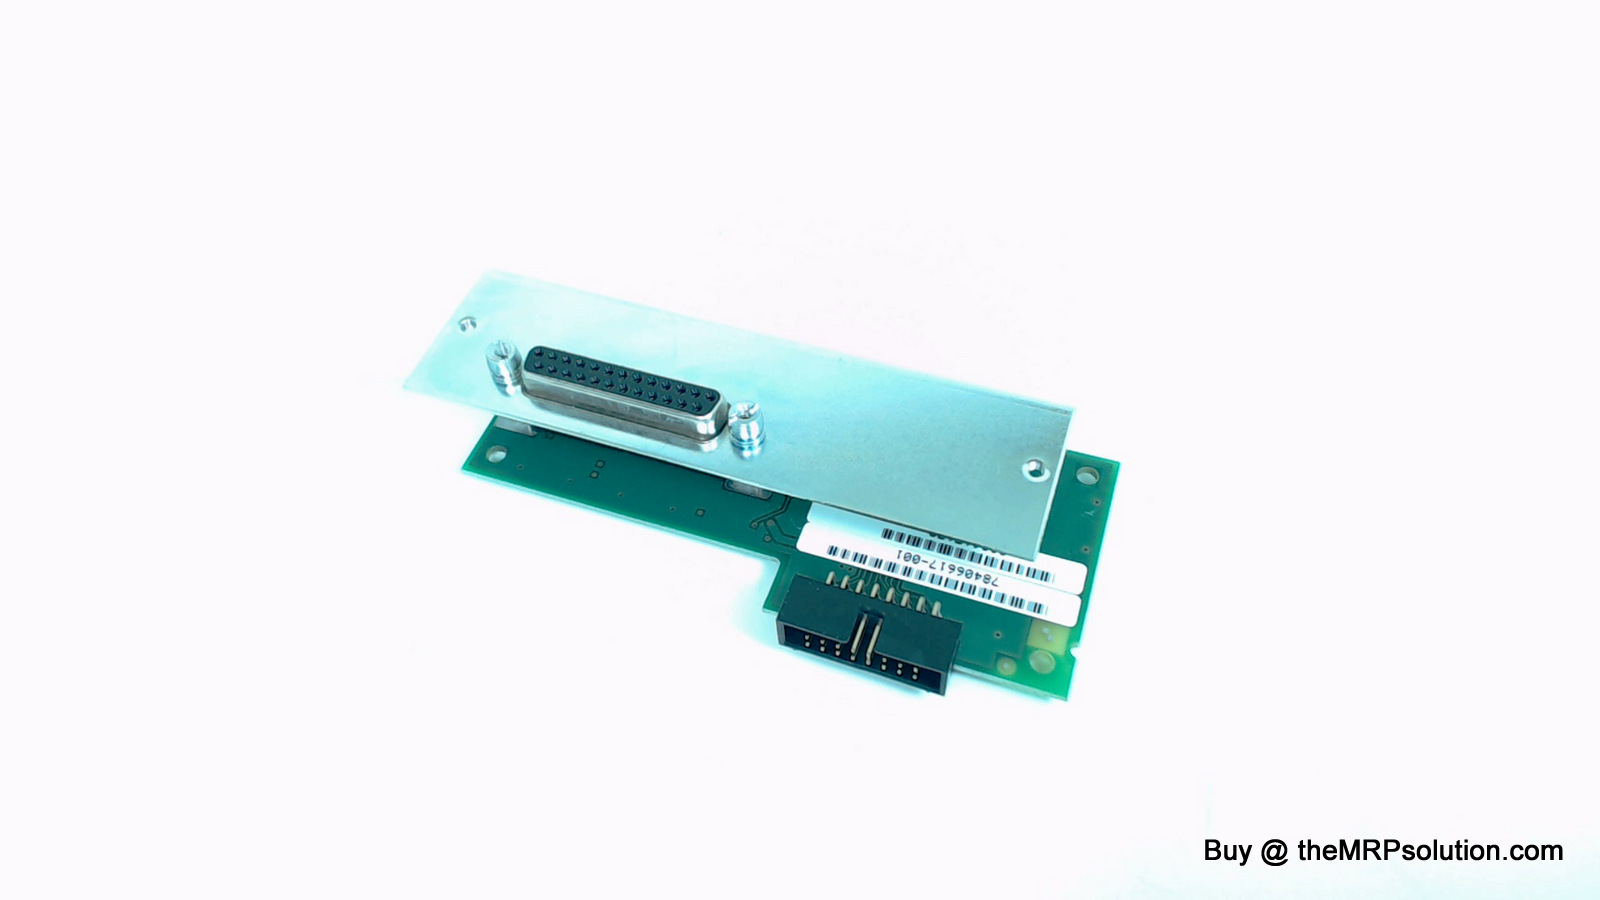 IBM 78406617-001 SERIAL IF, 4247-A00 Refurbished